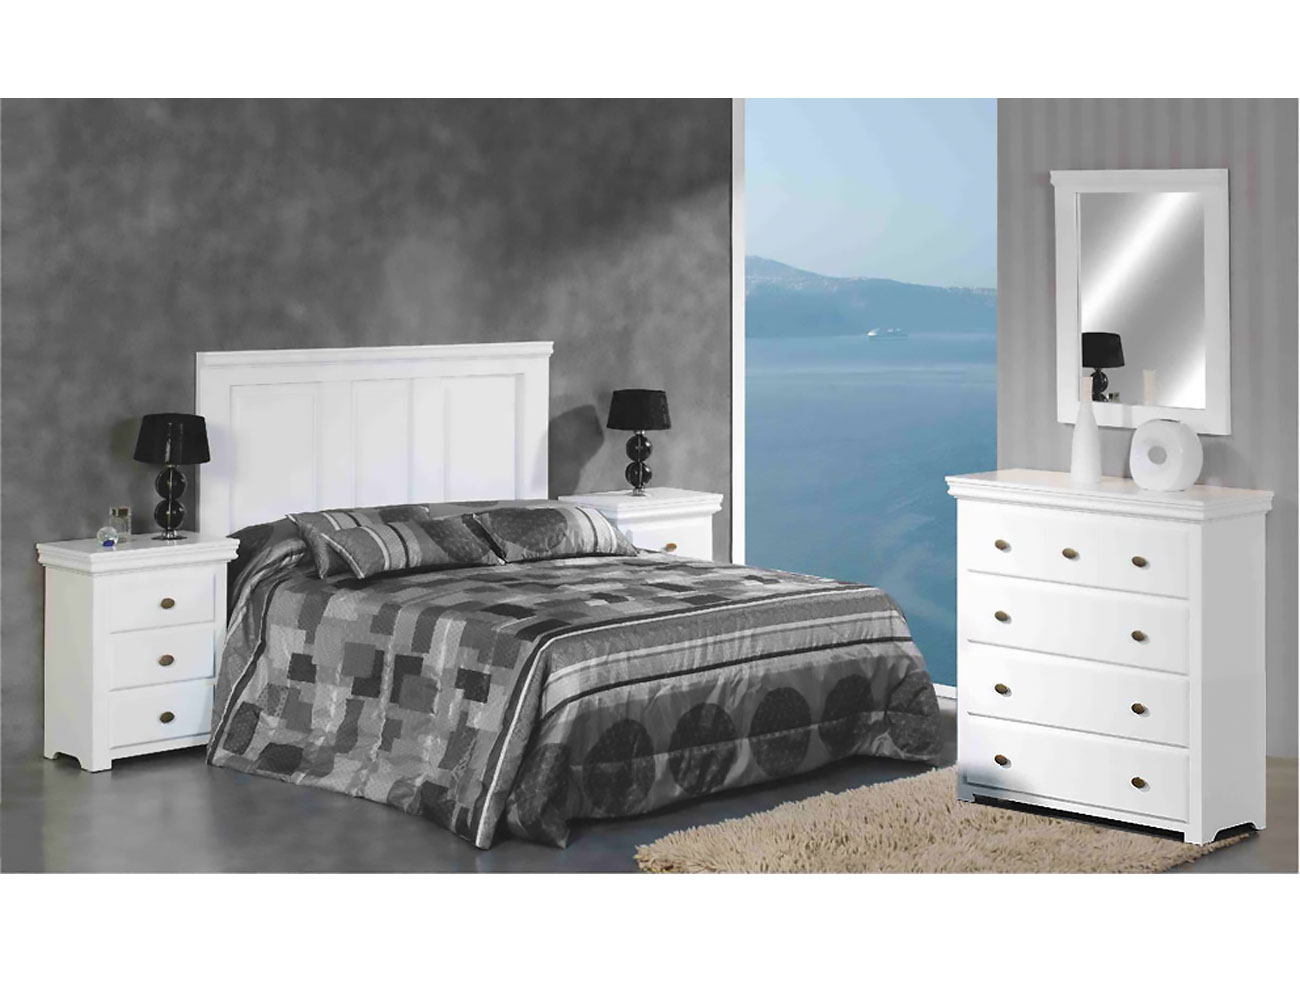 Dormitorio matrimonio comoda 5 c madera dm lacado blanco2